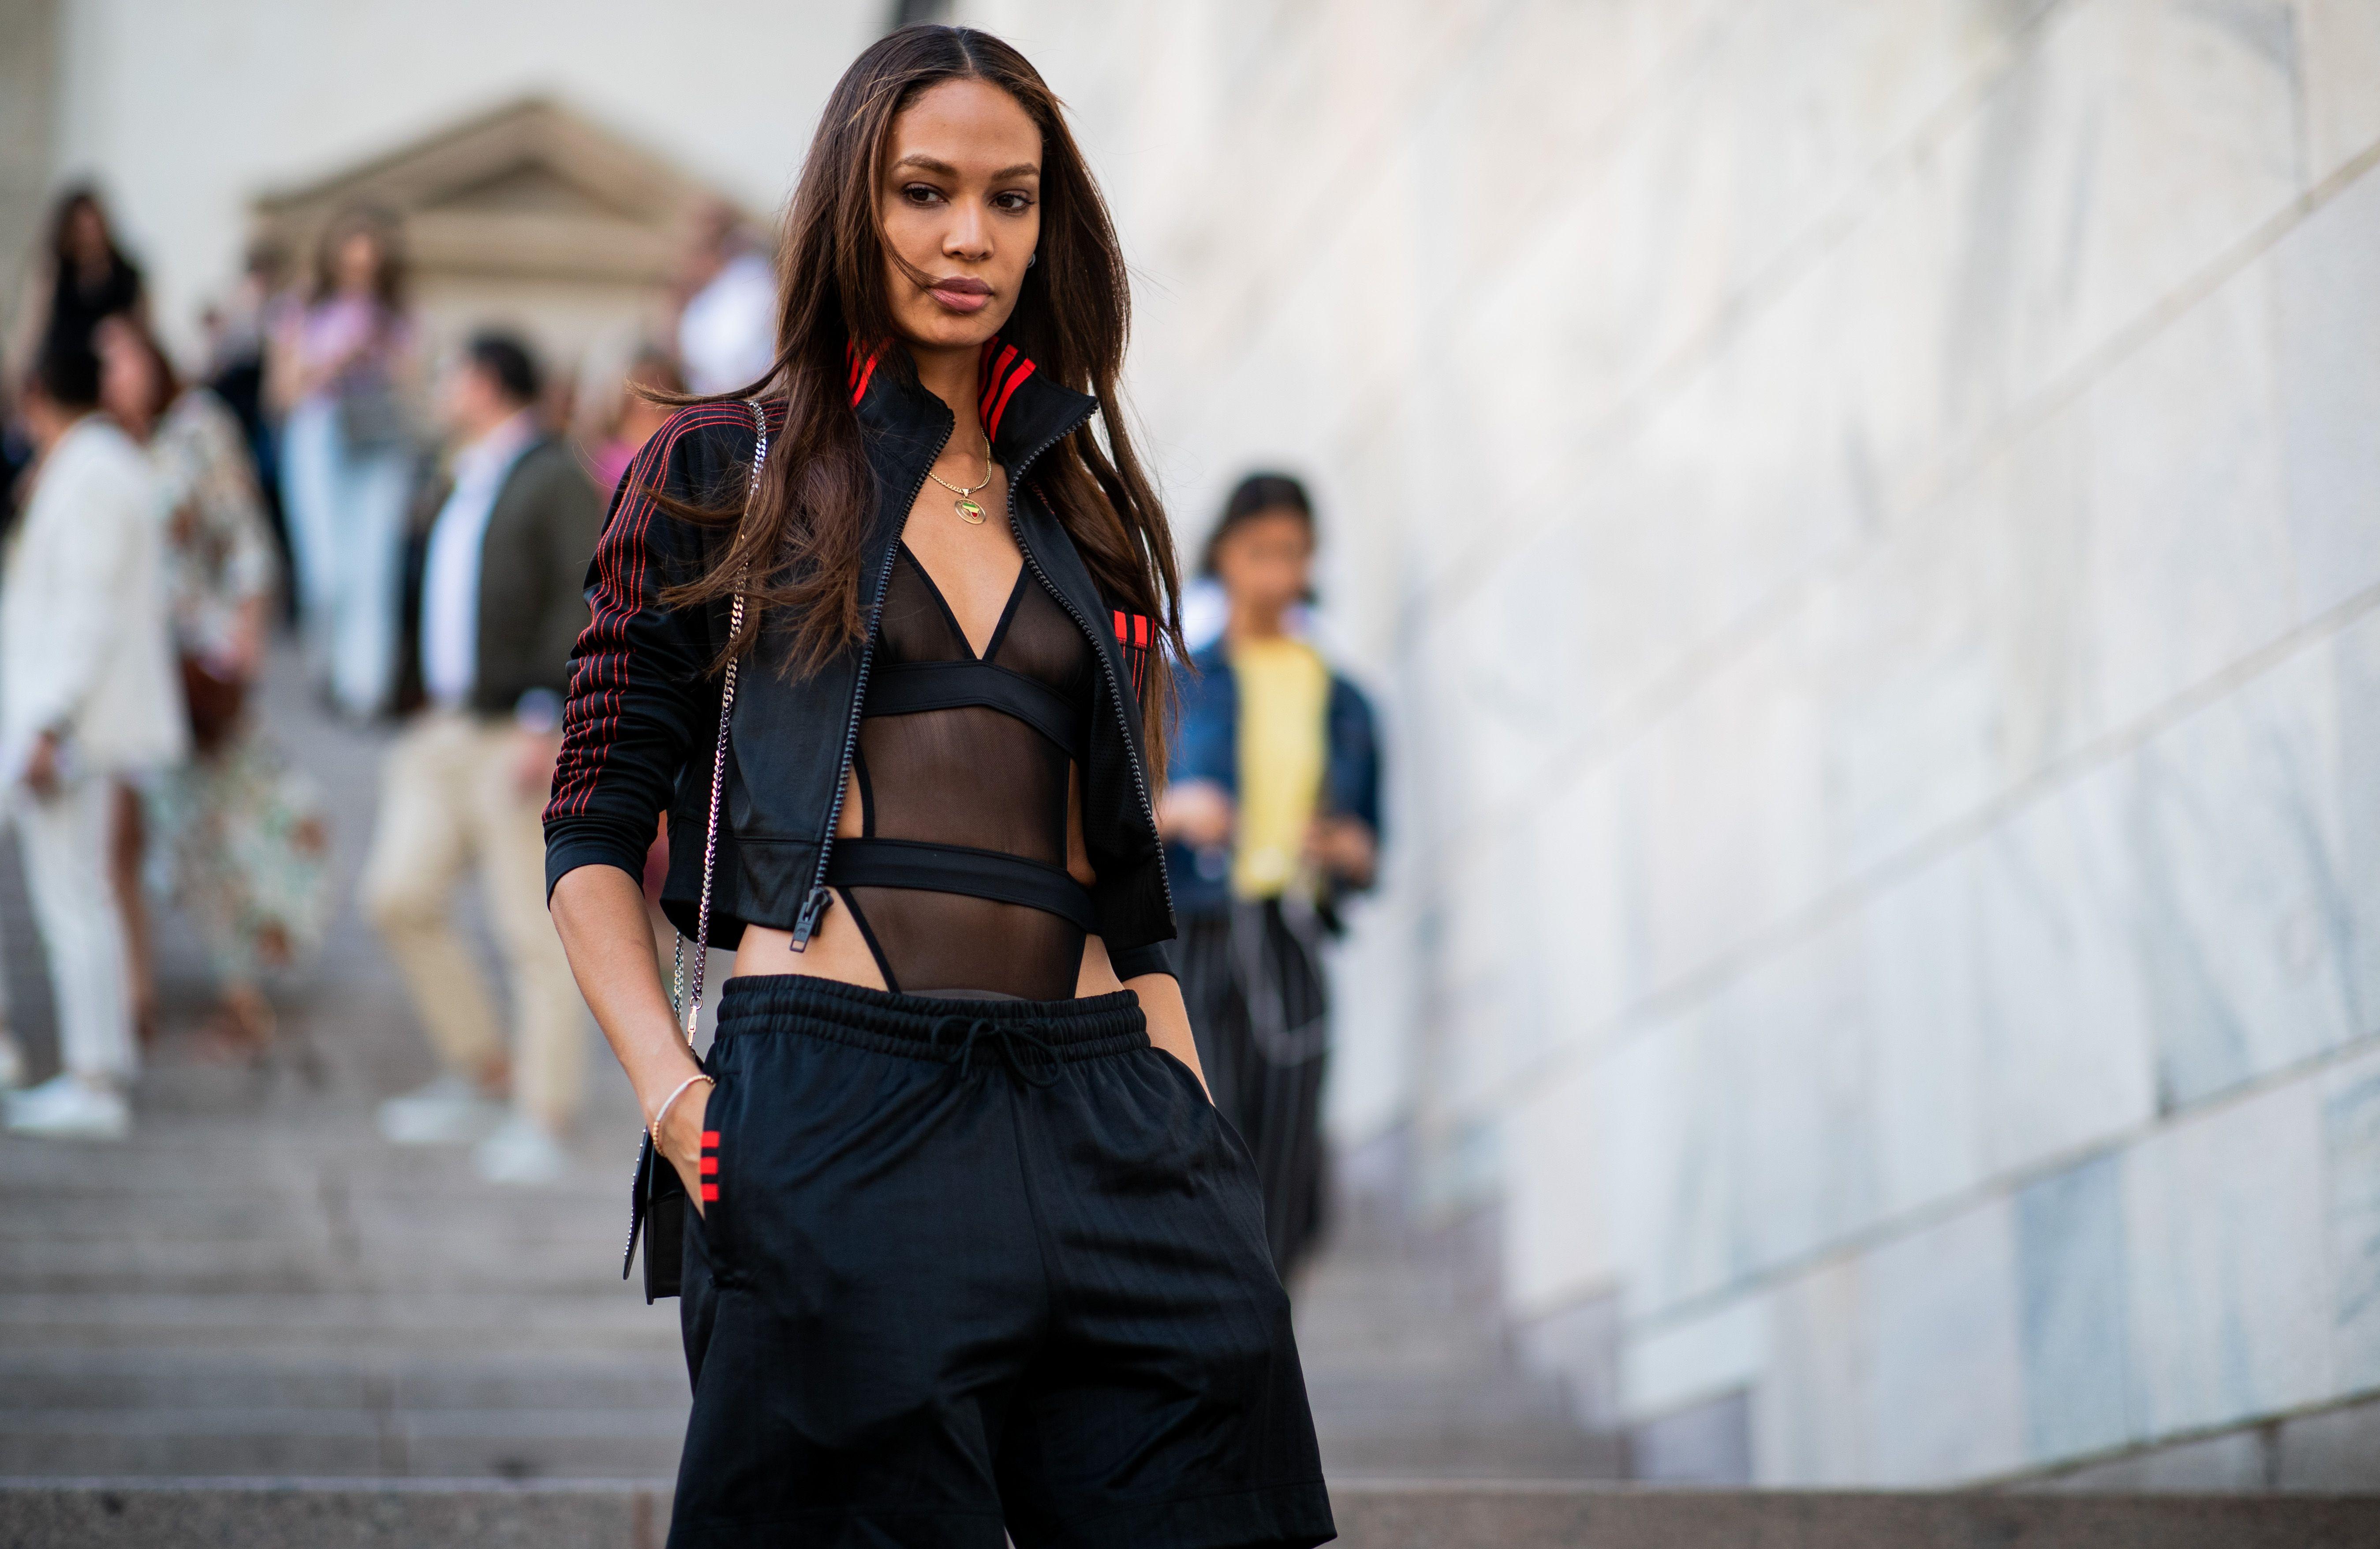 c8c59c3270bb Standout Street Style from Milan Fashion Week Men s Spring Summer 2019